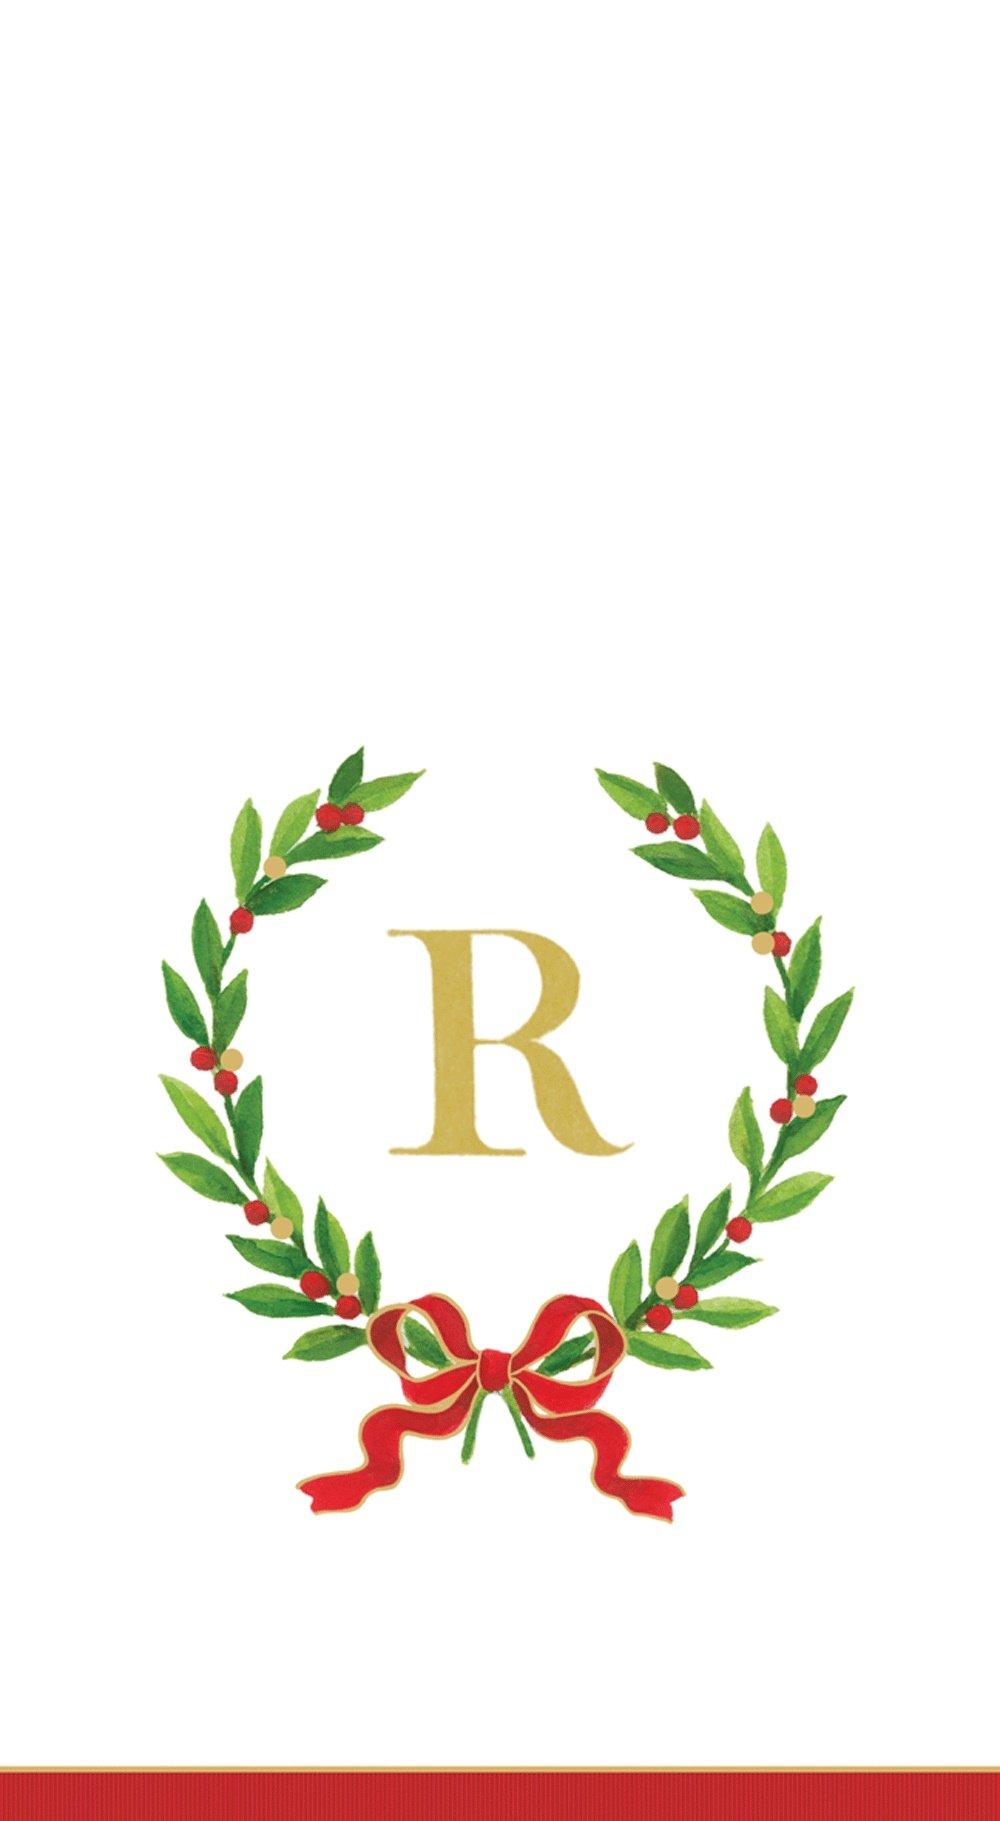 Entertaining with Caspari Christmas Laurel Wreath Paper Guest Towels, Monogram Initial R, Pack of 15